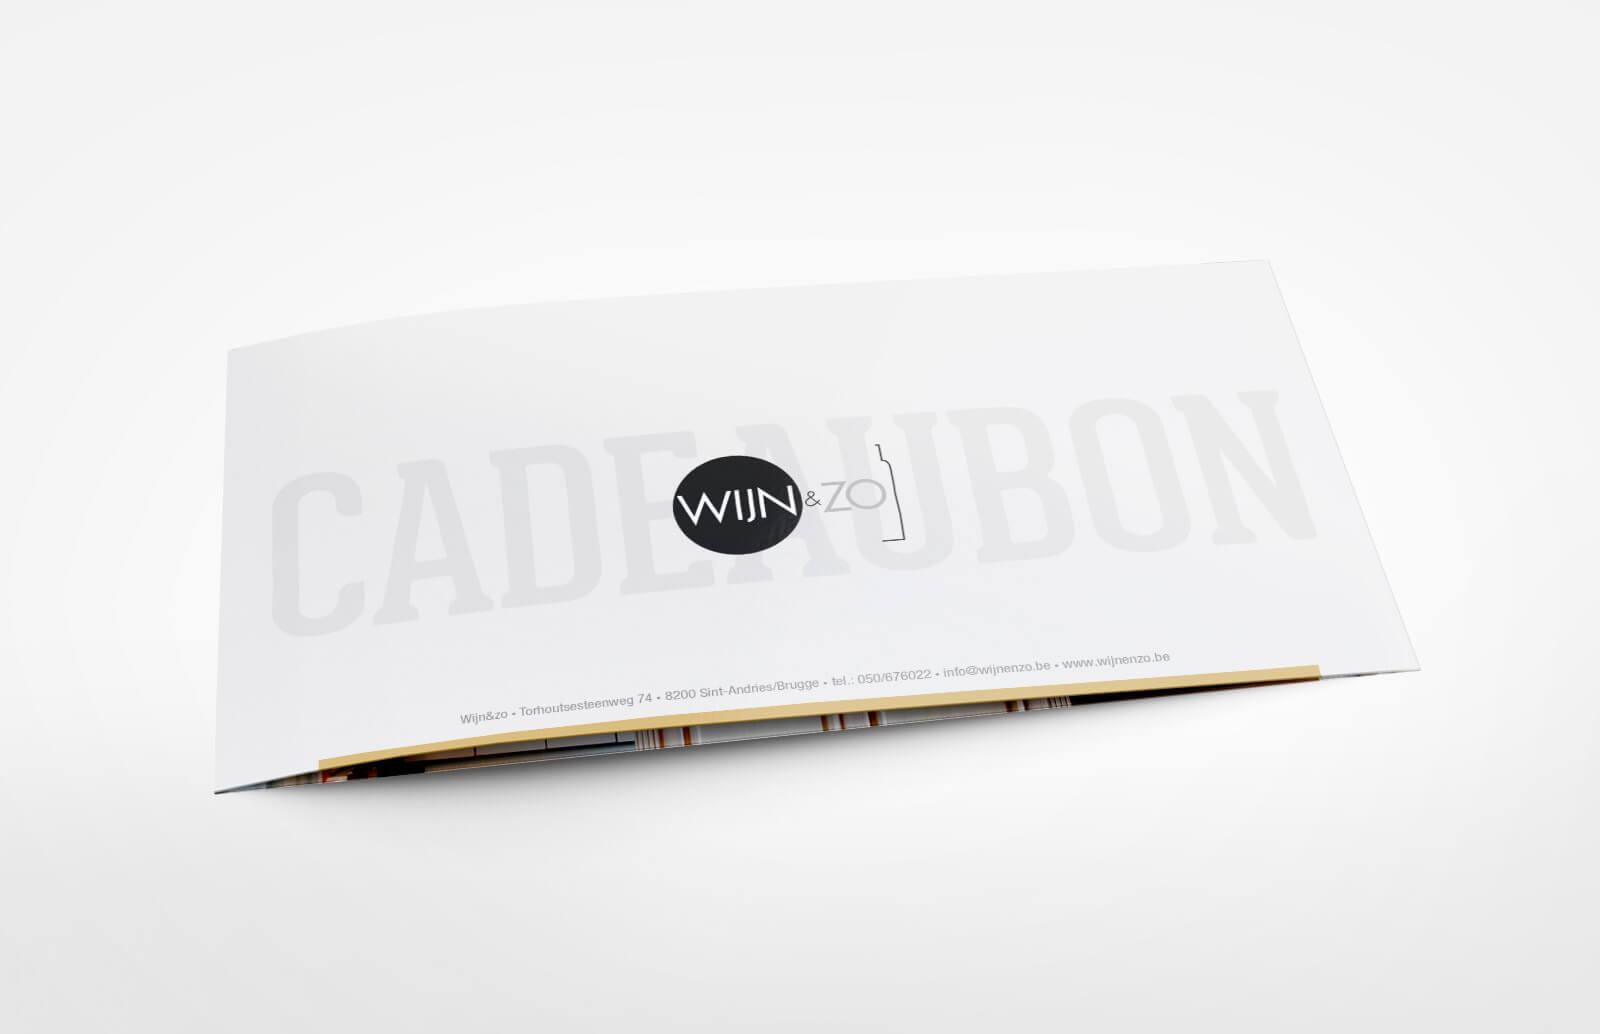 Wijnenzo - Webdesign Weblounge Brugge